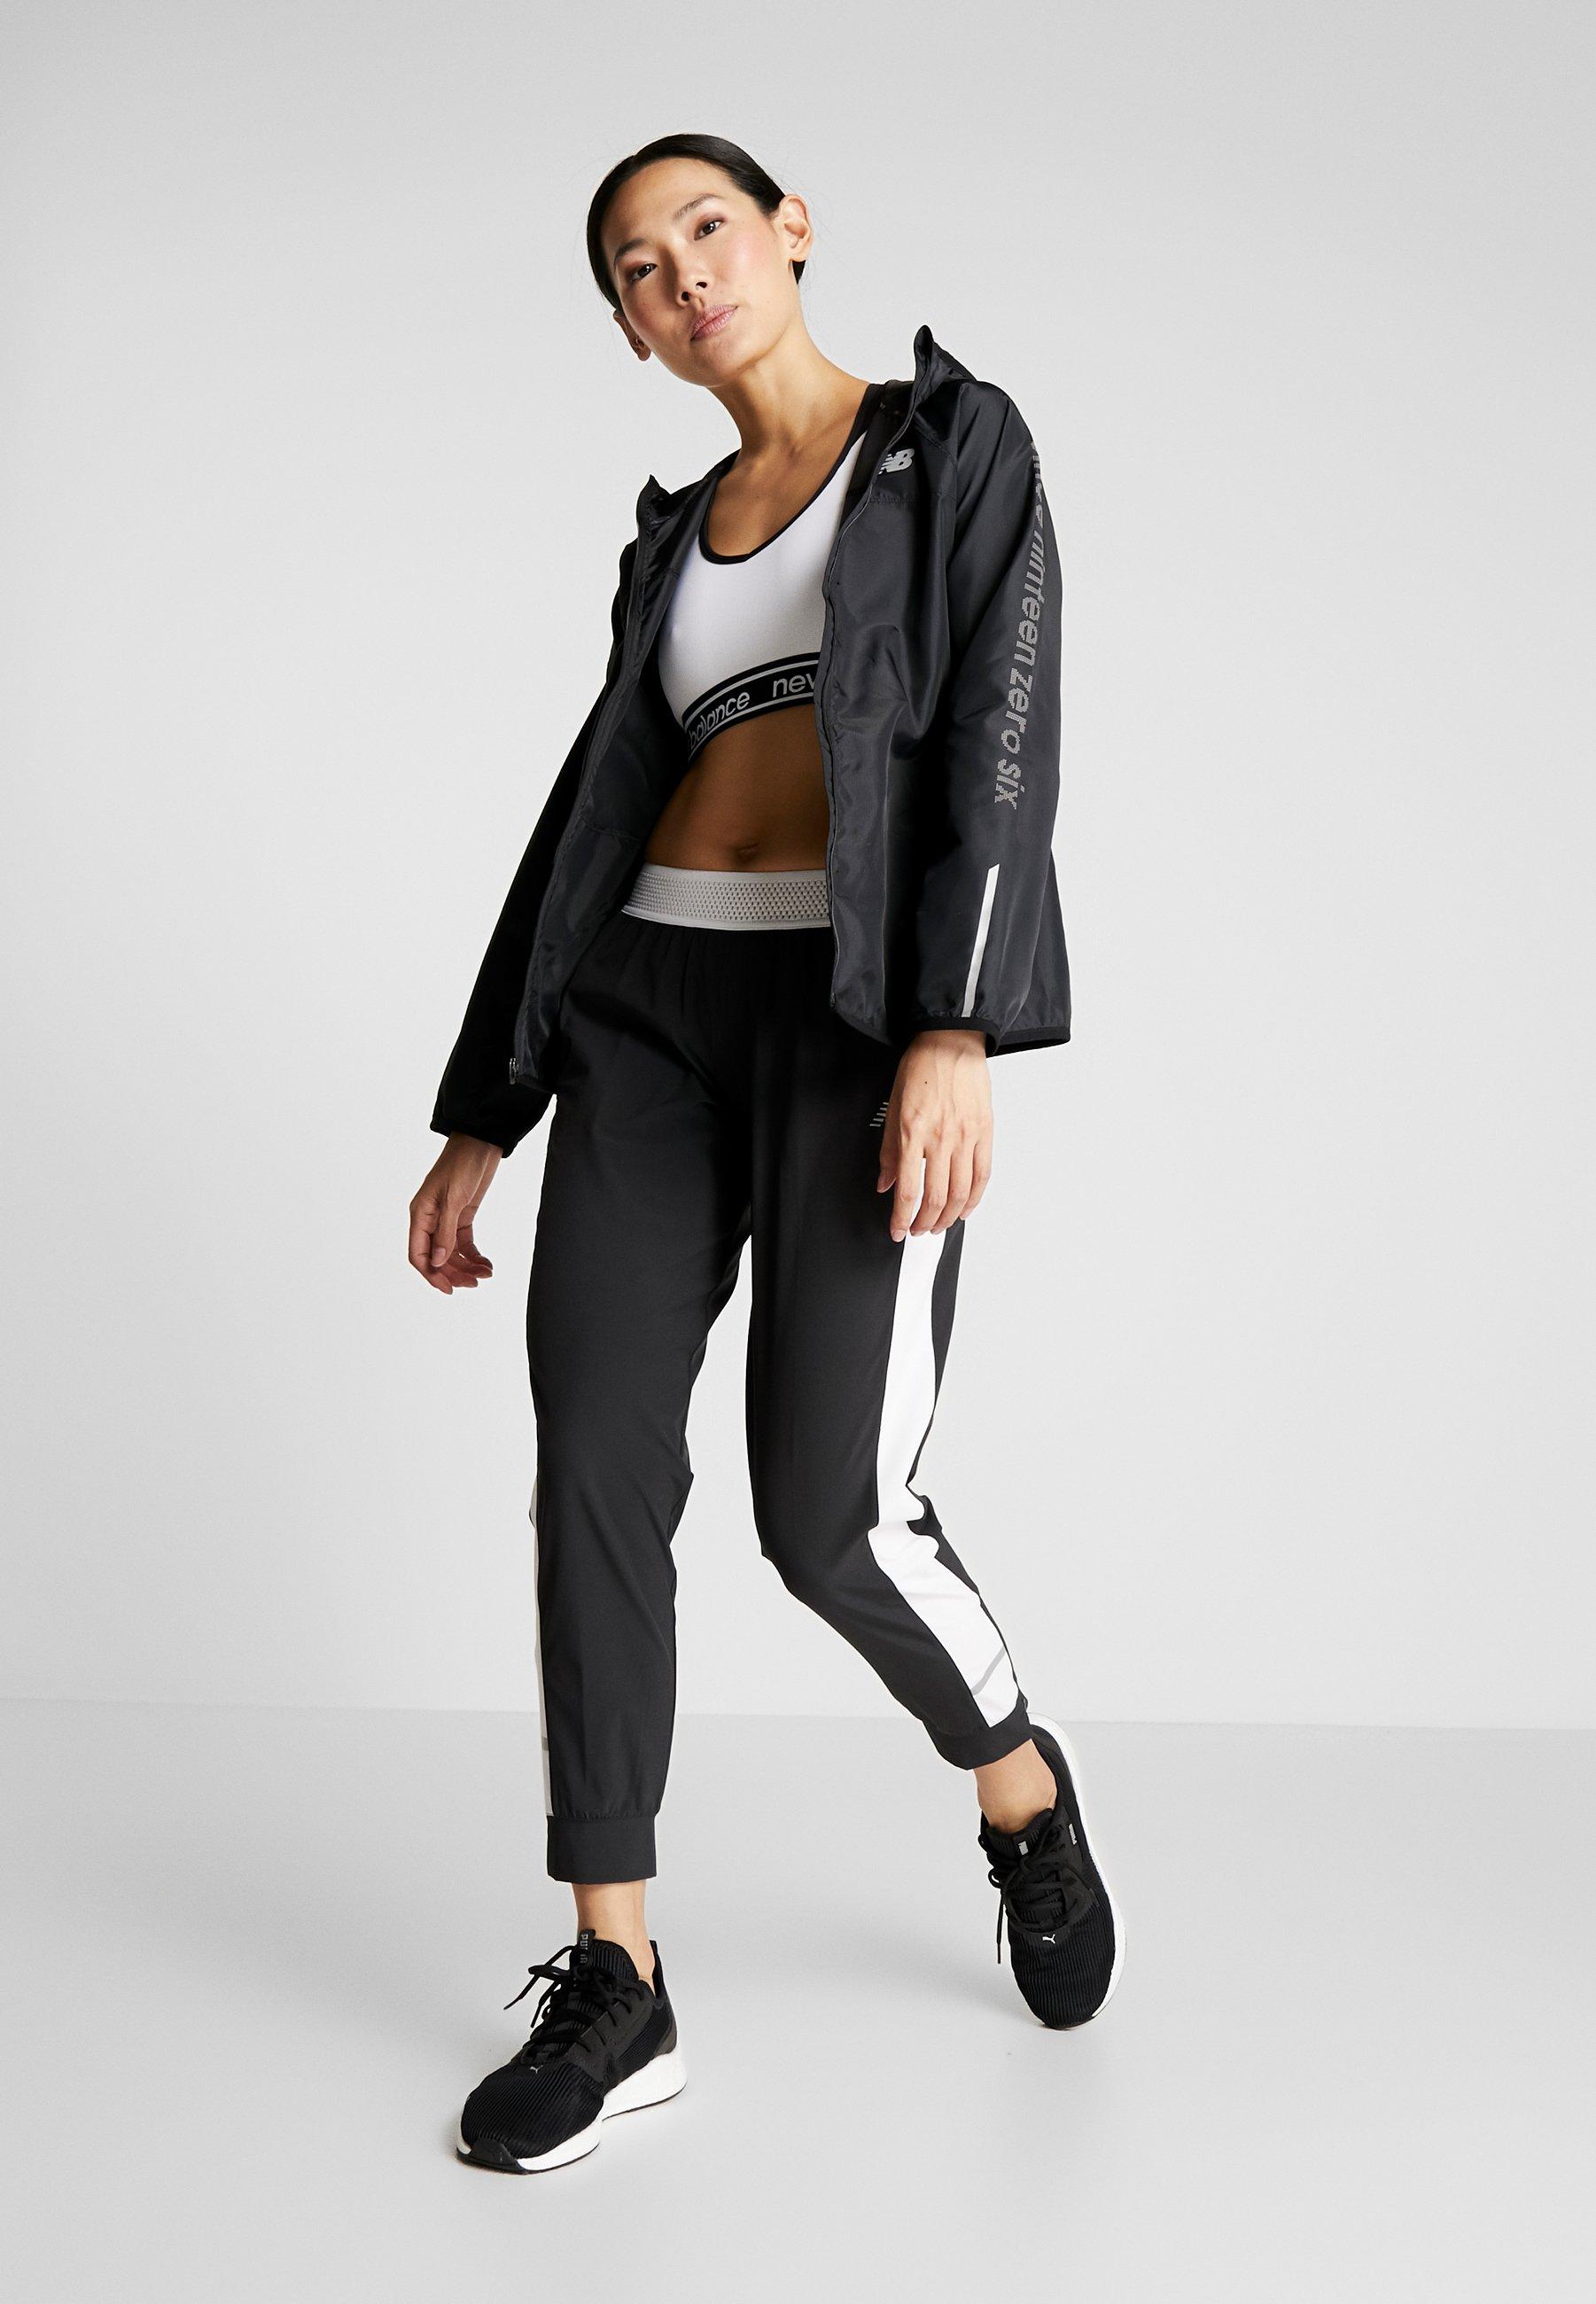 New Balance Accelerate Windcheater Reflective Jacket - Sports Black